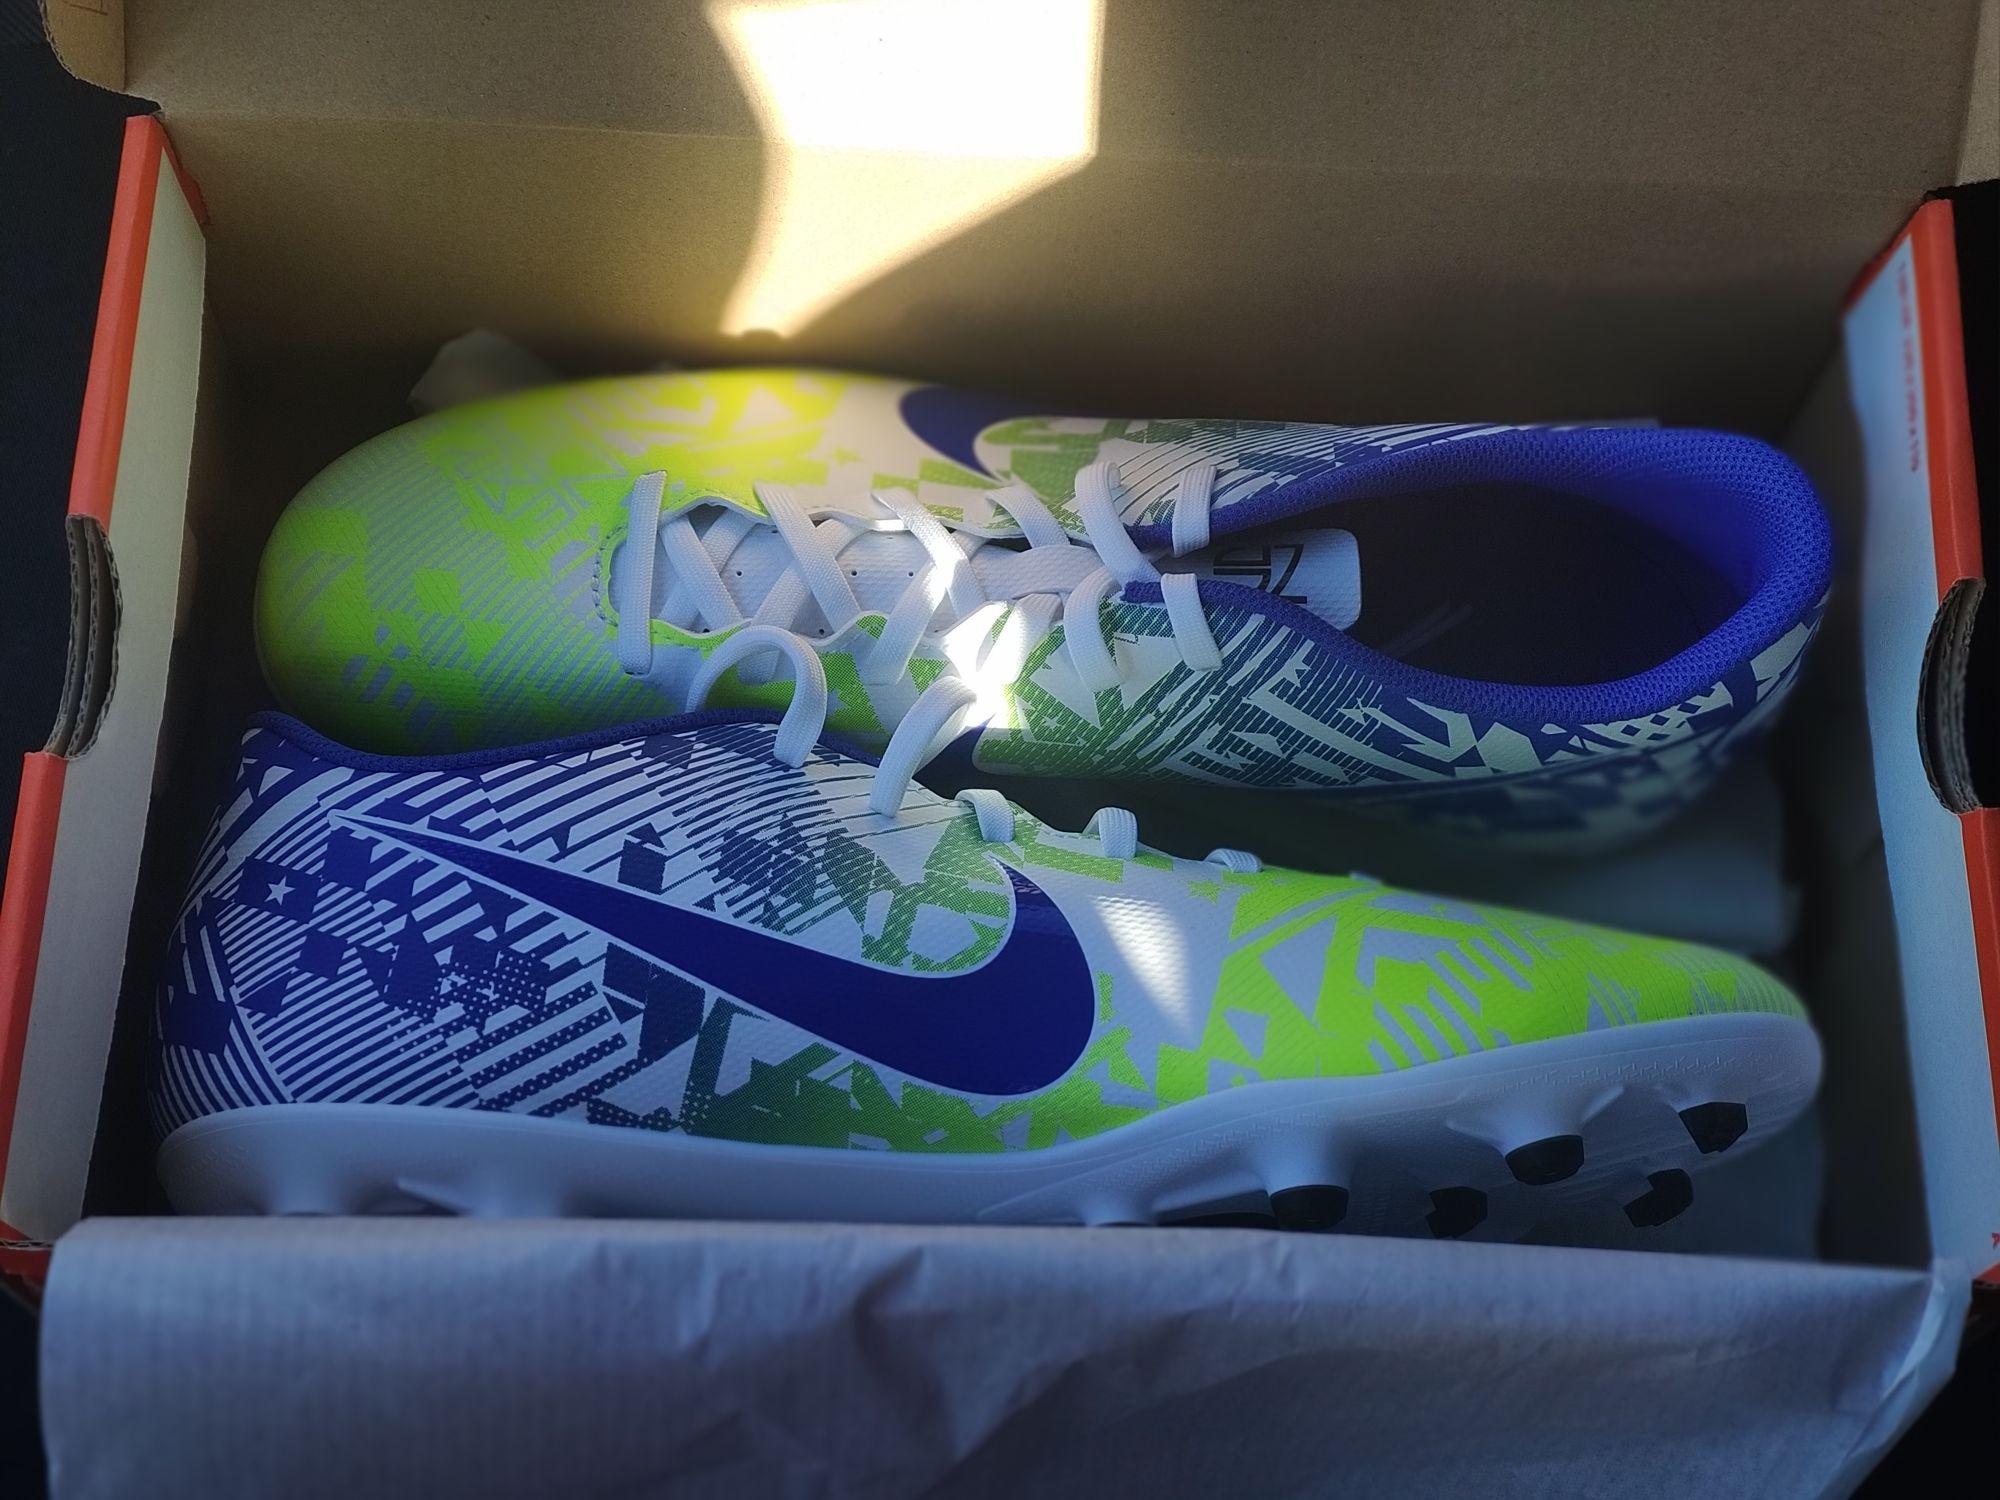 Chaussures de football Nike Mercurial Vapor 13 Club NJR FG/MG - Nike Factory Store Rennes/Saint-Gregoire (35)